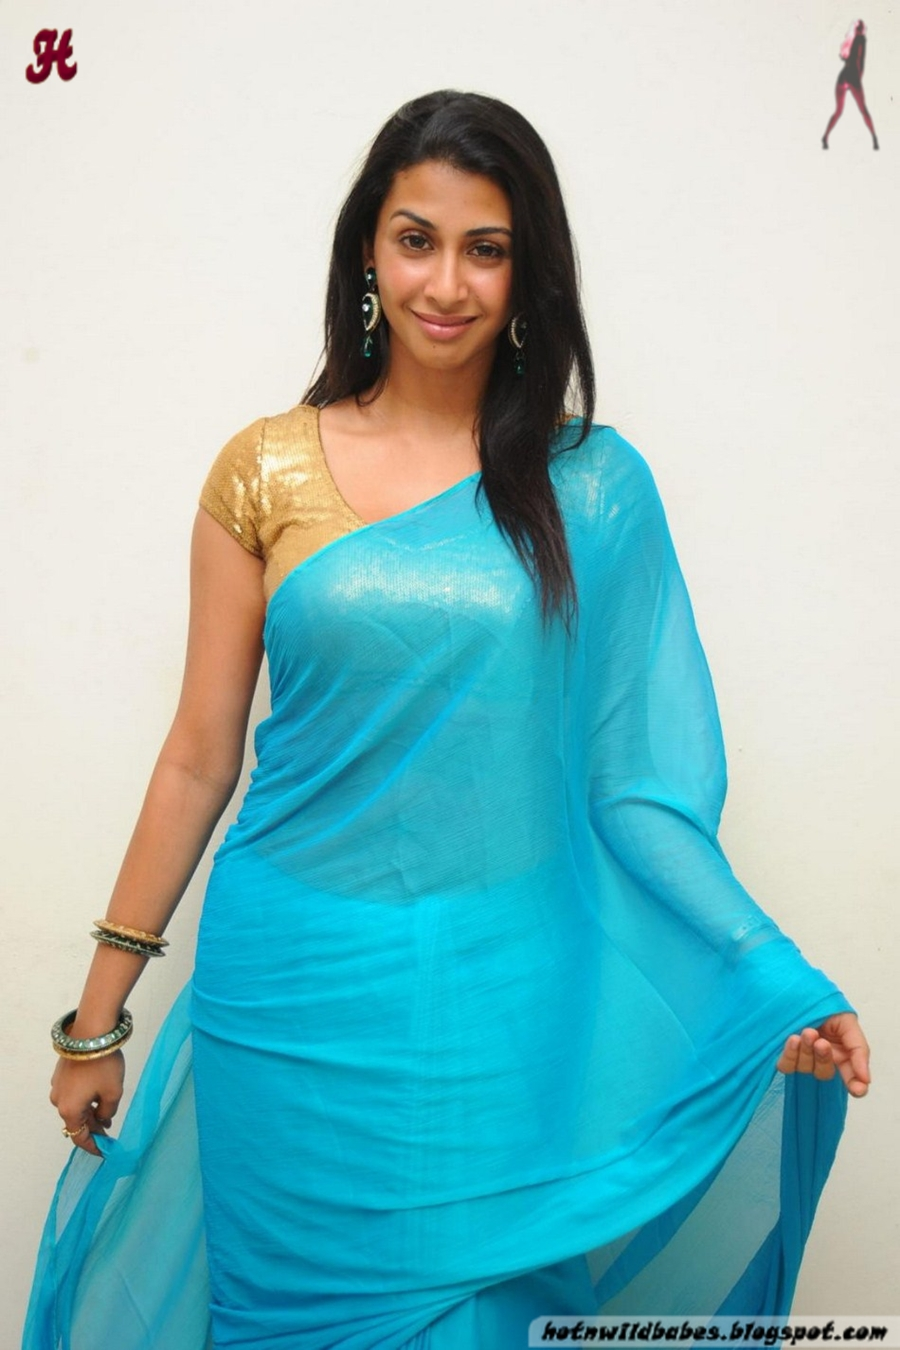 Ranginduniain Gayatri Iyer Flaunting Her Fleshy Curves In -2872